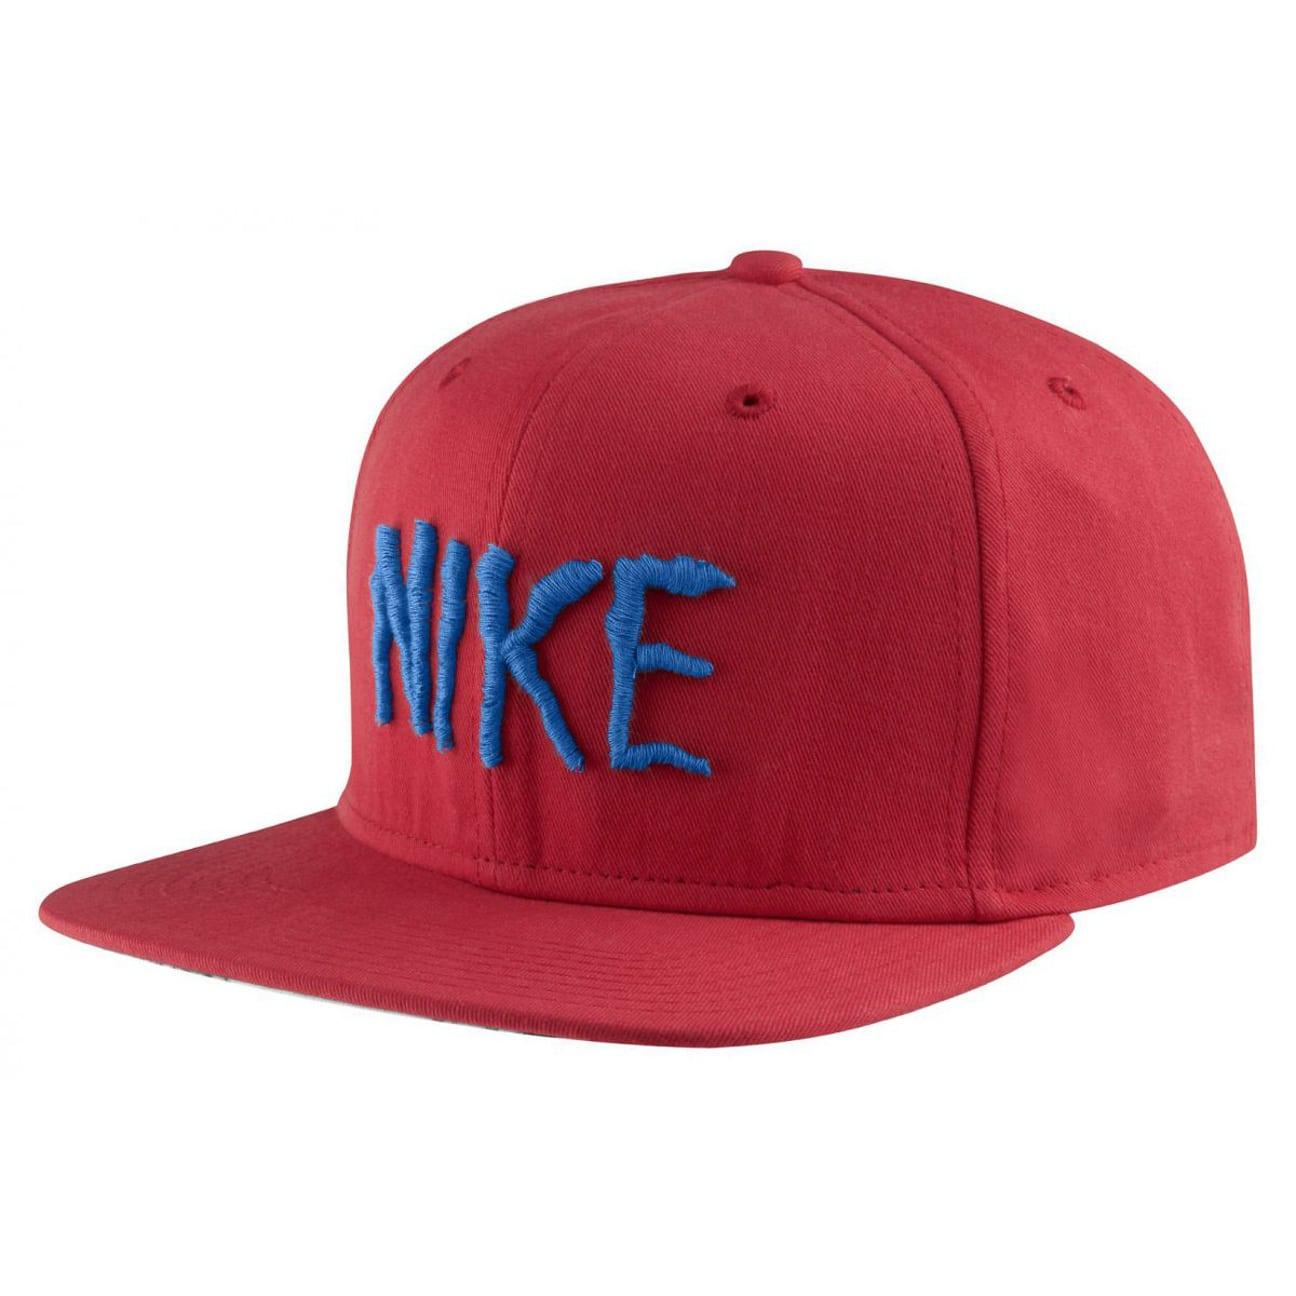 neckface snapback cap by nike eur 29 95 hats caps. Black Bedroom Furniture Sets. Home Design Ideas